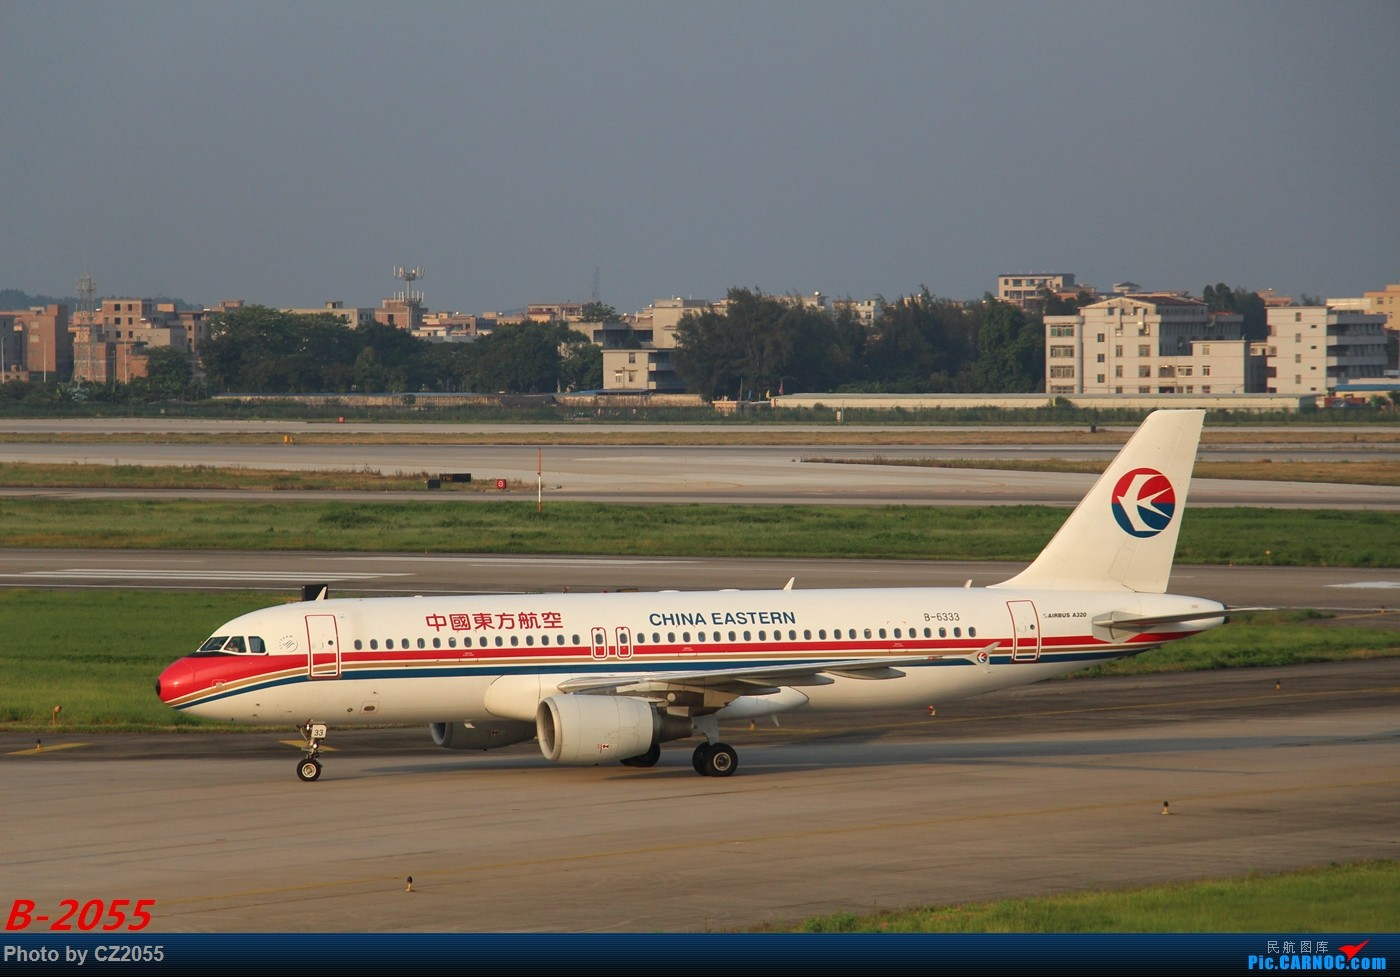 Re:[原创]Re:[原创]【广东青少年拍机小队】【C-Z-2055】发完737和宽体就升级320,那就再发一组320系列。 AIRBUS A320-200 B-6333 中国广州白云国际机场